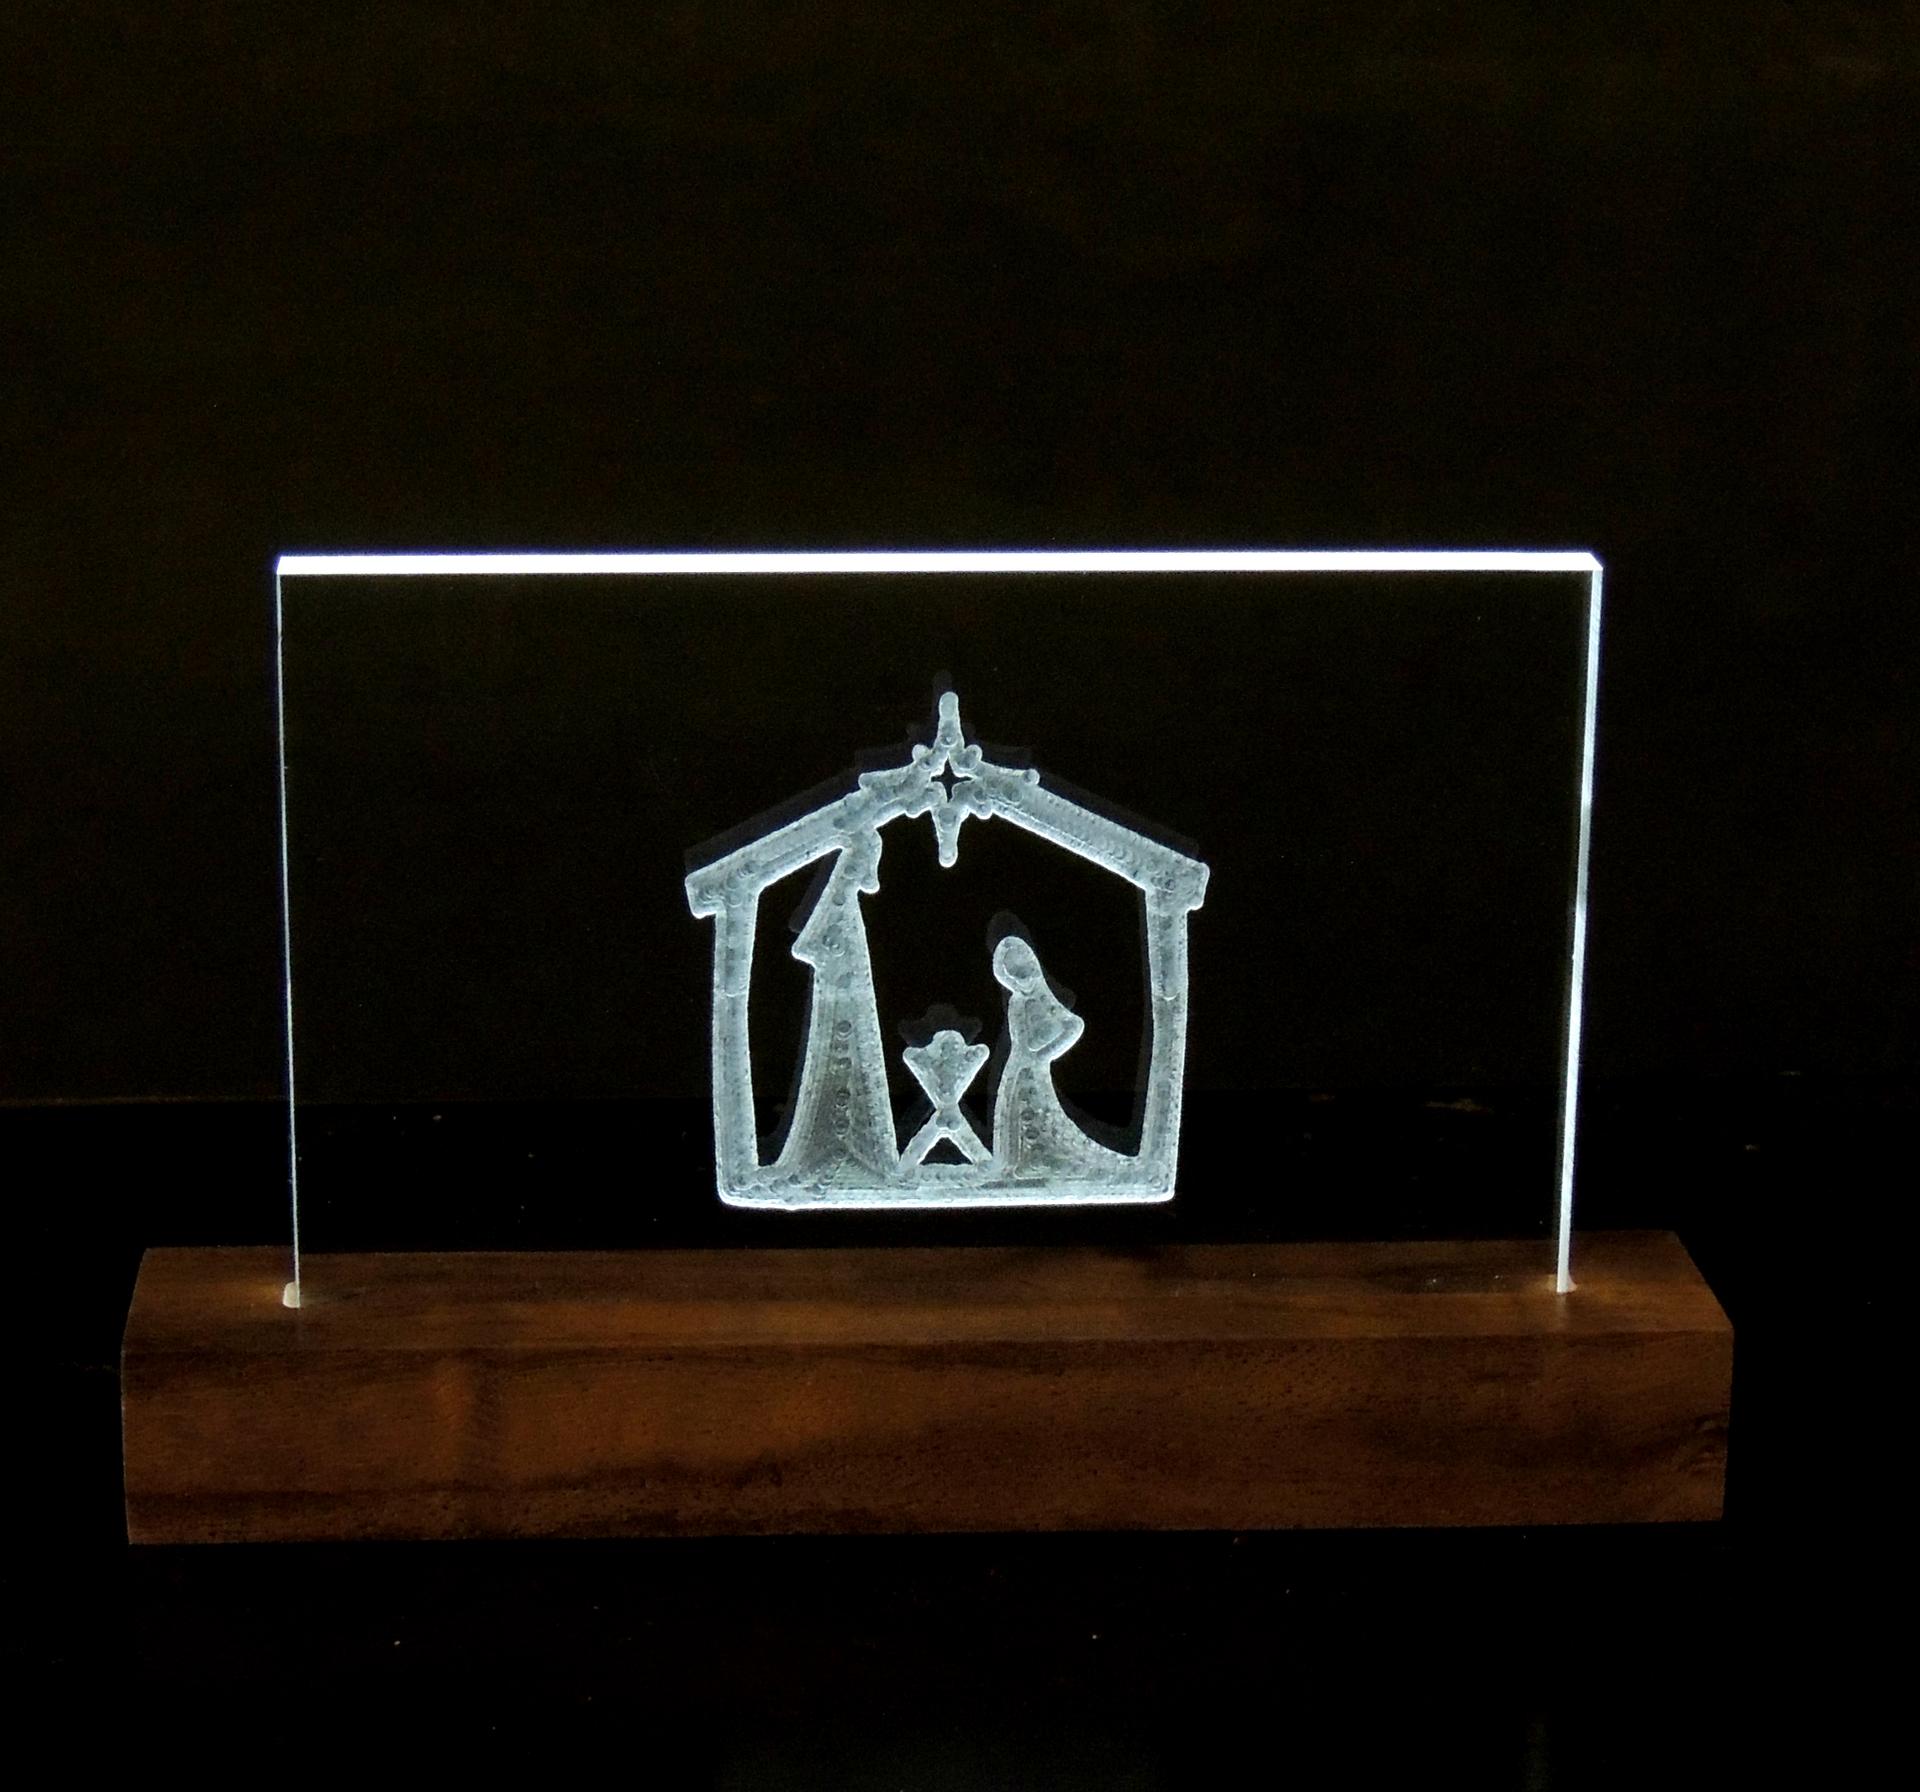 edge lit led sign projects inventables community forum. Black Bedroom Furniture Sets. Home Design Ideas